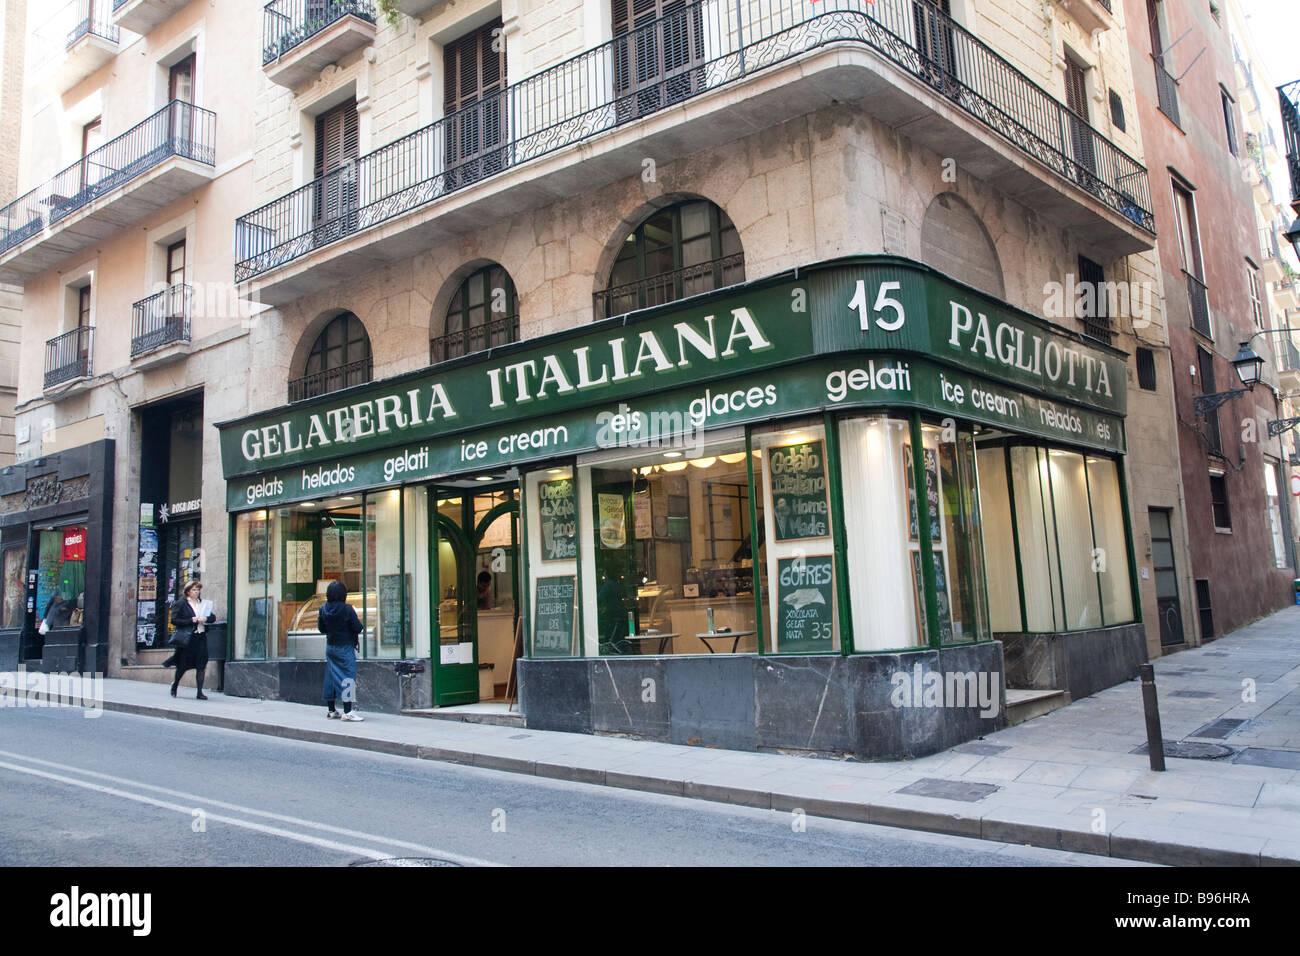 La Gelateria Italiana, Barcelona España Imagen De Stock